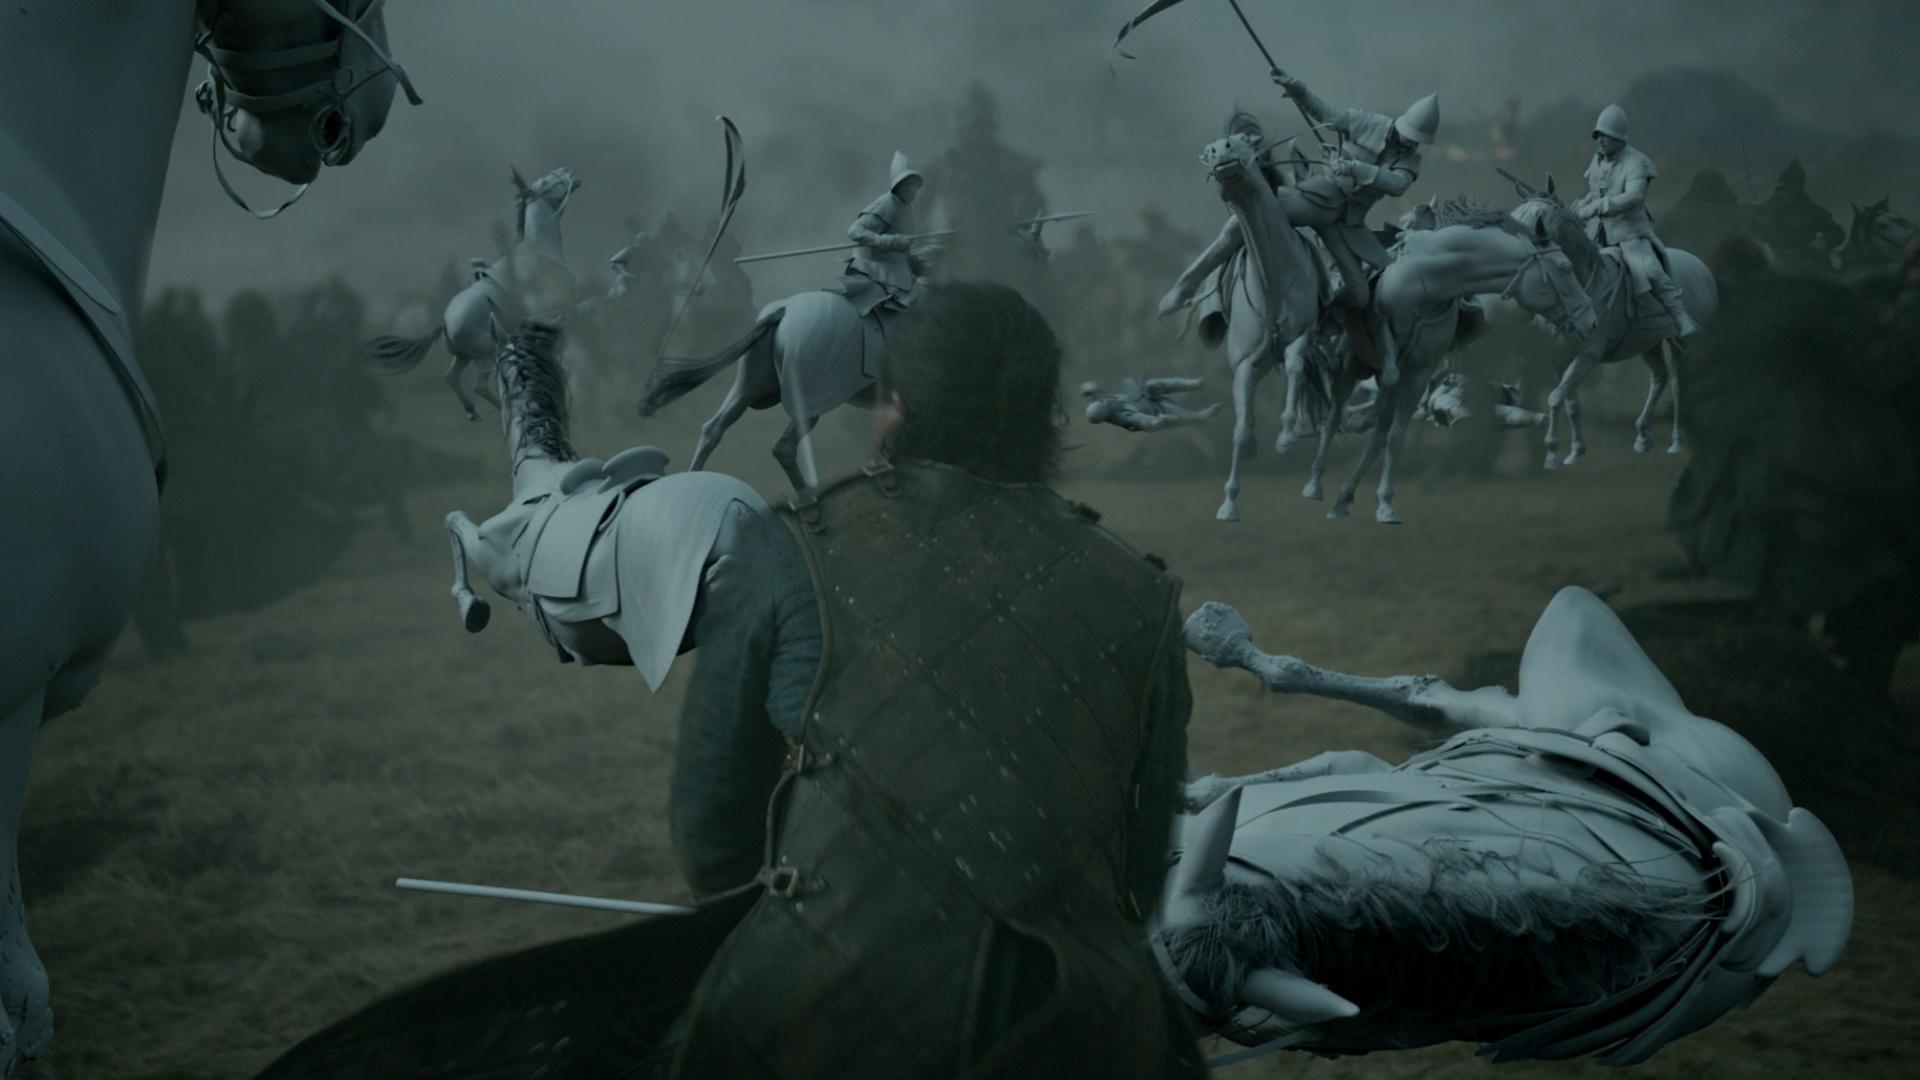 Game Of Thrones Season 6 Battle Of The Bastards